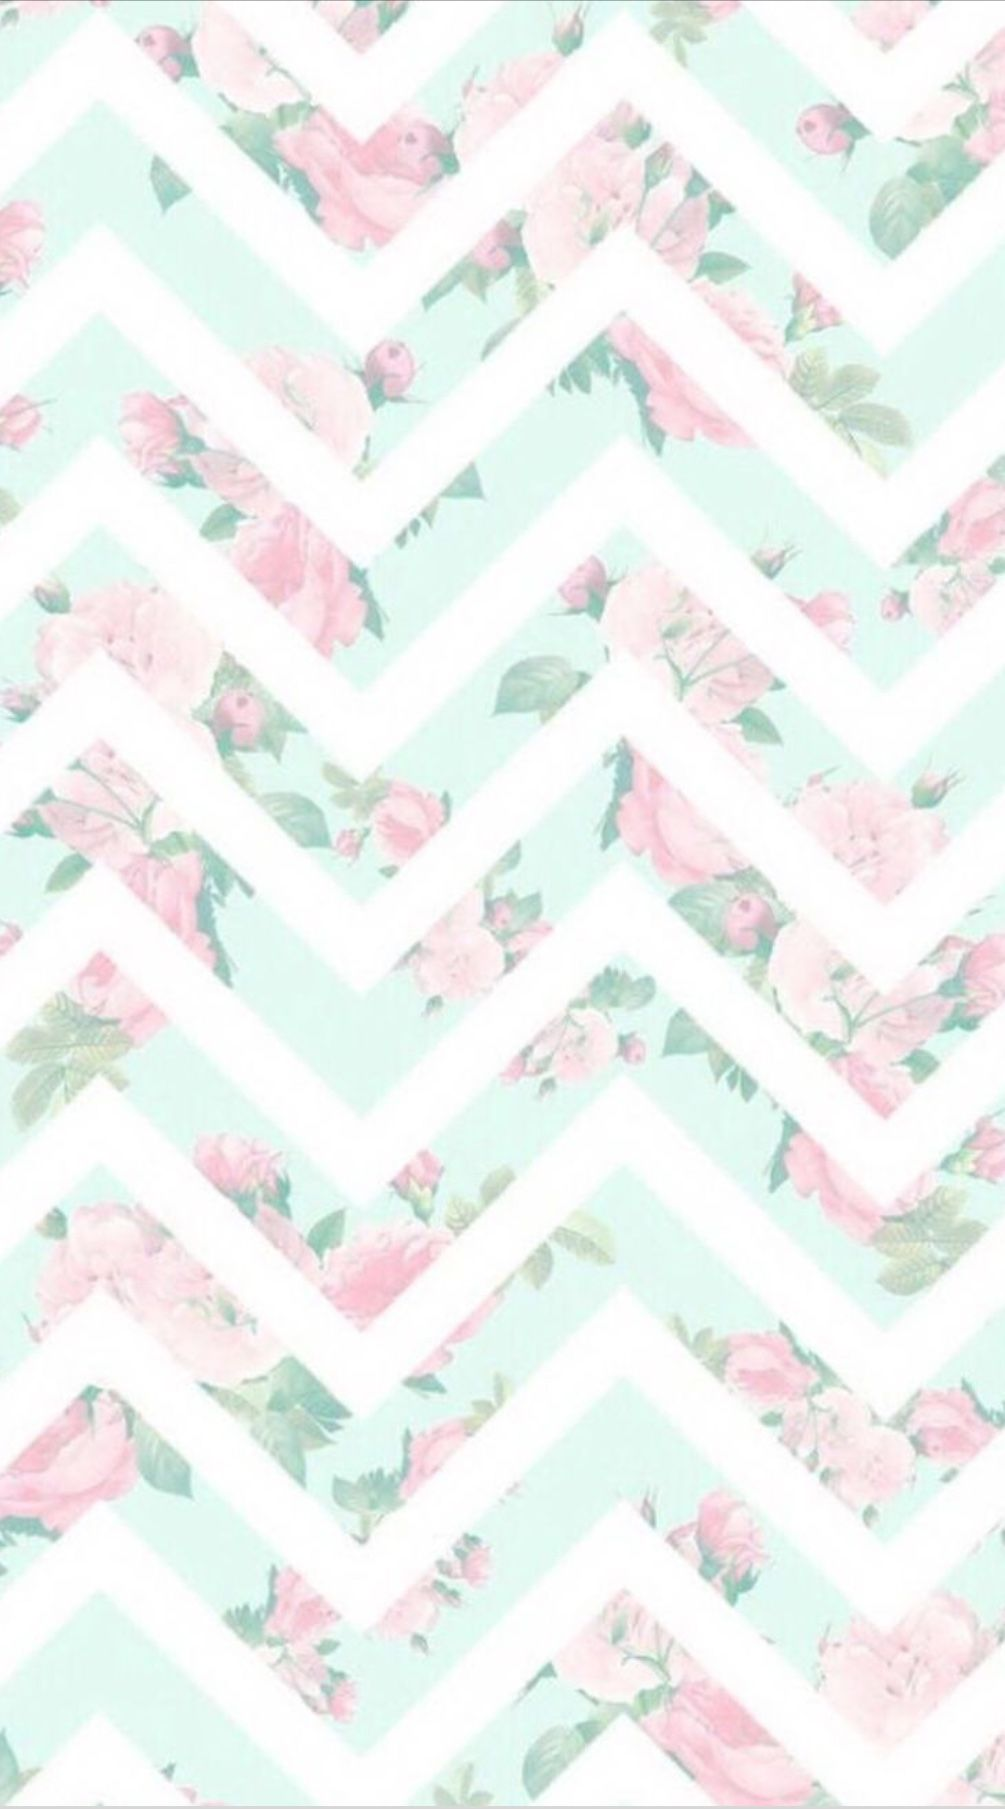 Pretty Wallpapers Screen Wallpaper Iphone Chevron Cute Tumblr